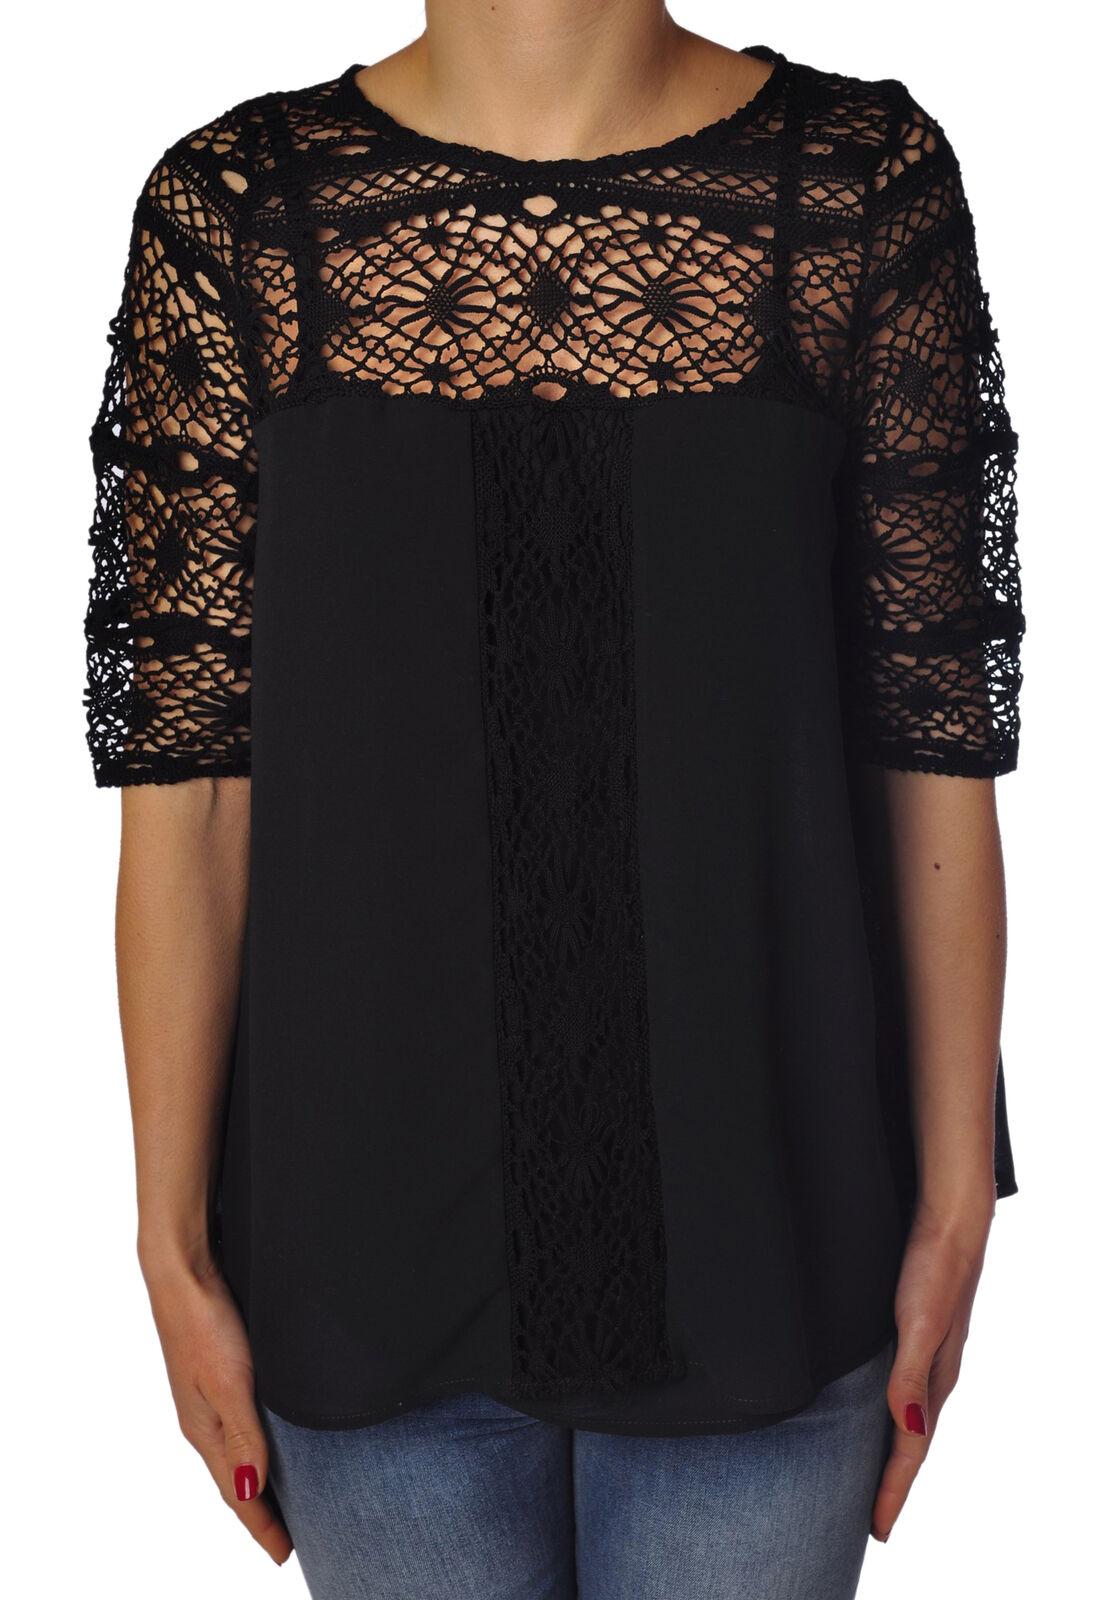 Soallure - Shirts-Blouses - woman - schwarz - 769517C183553